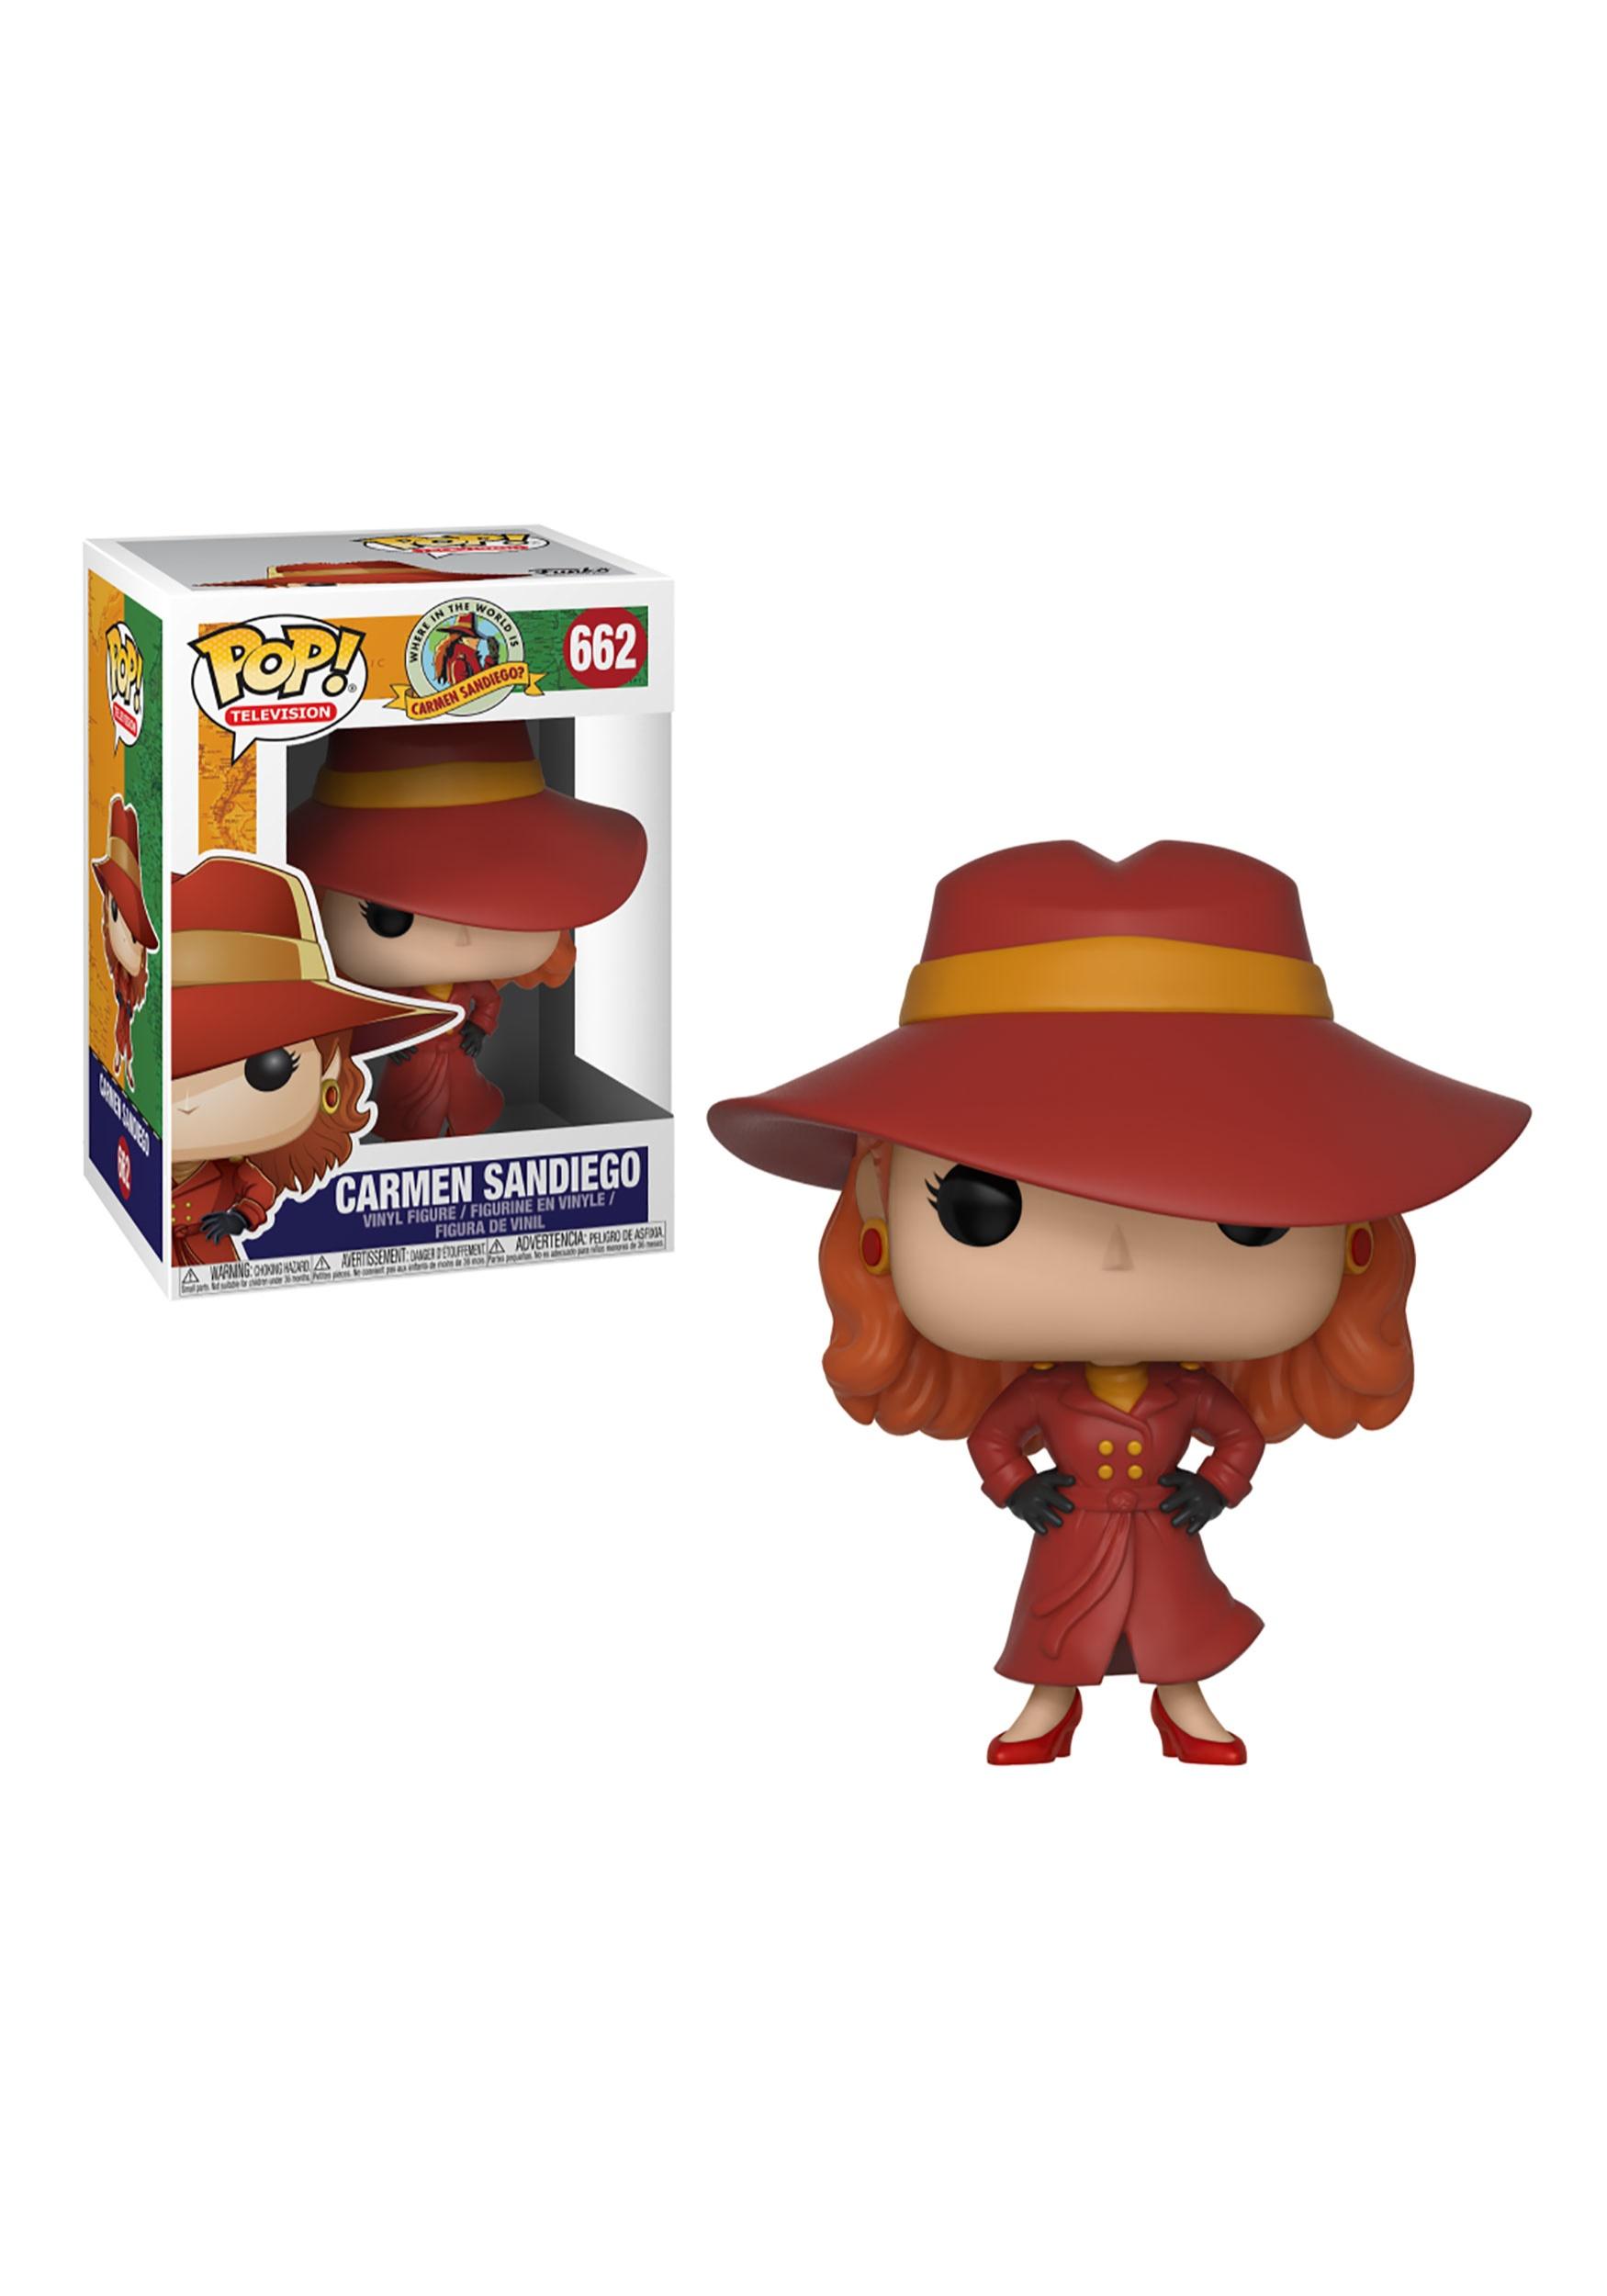 Pop carmen sandiego vinyl figure jpg 1750x2500 Hat carmen sandiego costume 2873902f8f42